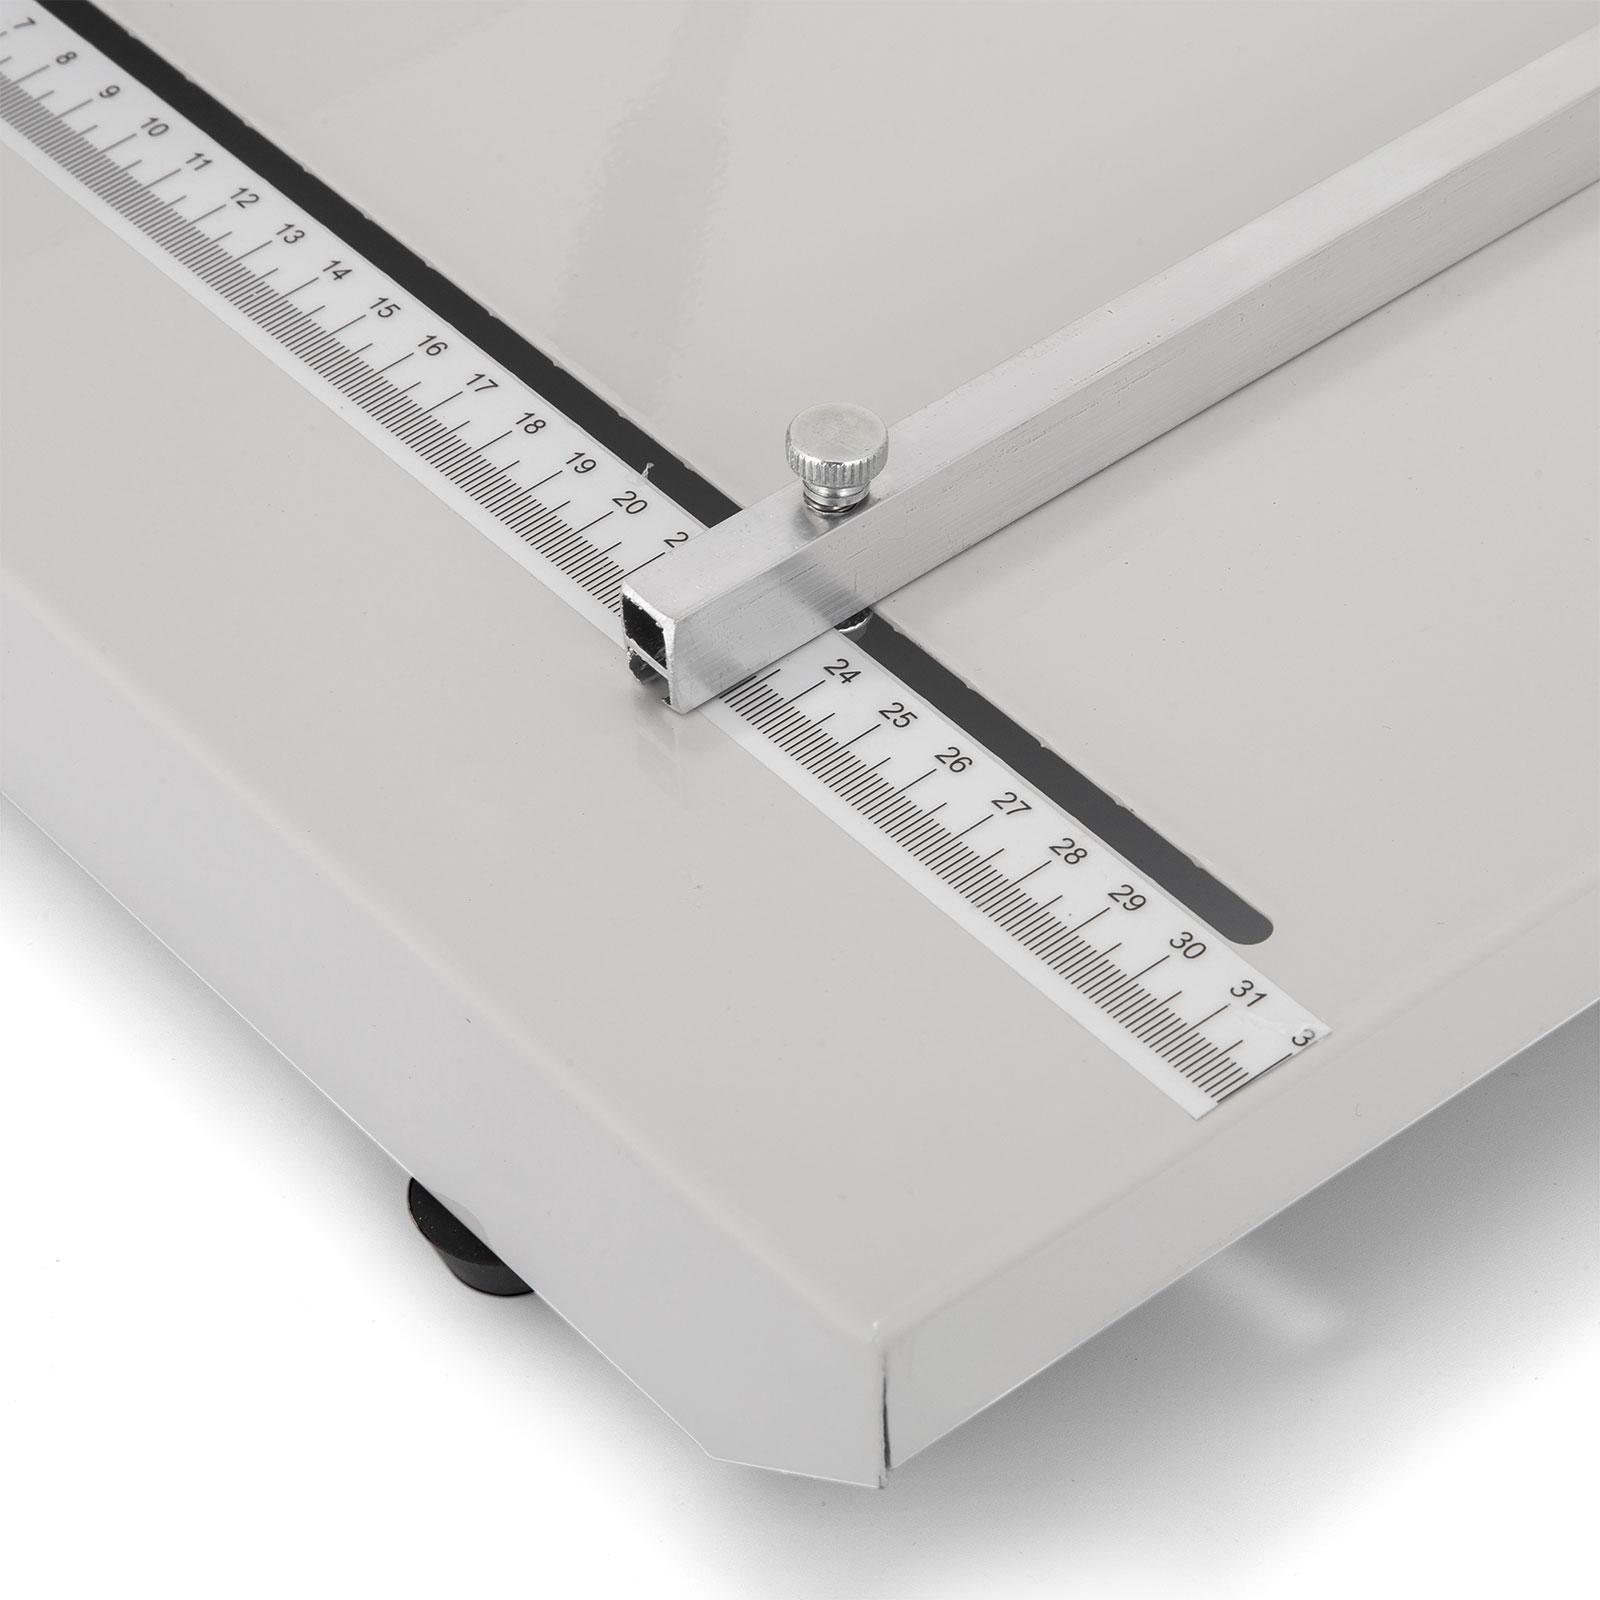 Cordonatrice-Perforatrice-Max-350-520mm-Profondita-Regolabile-Elettrica-Manuale miniatura 55